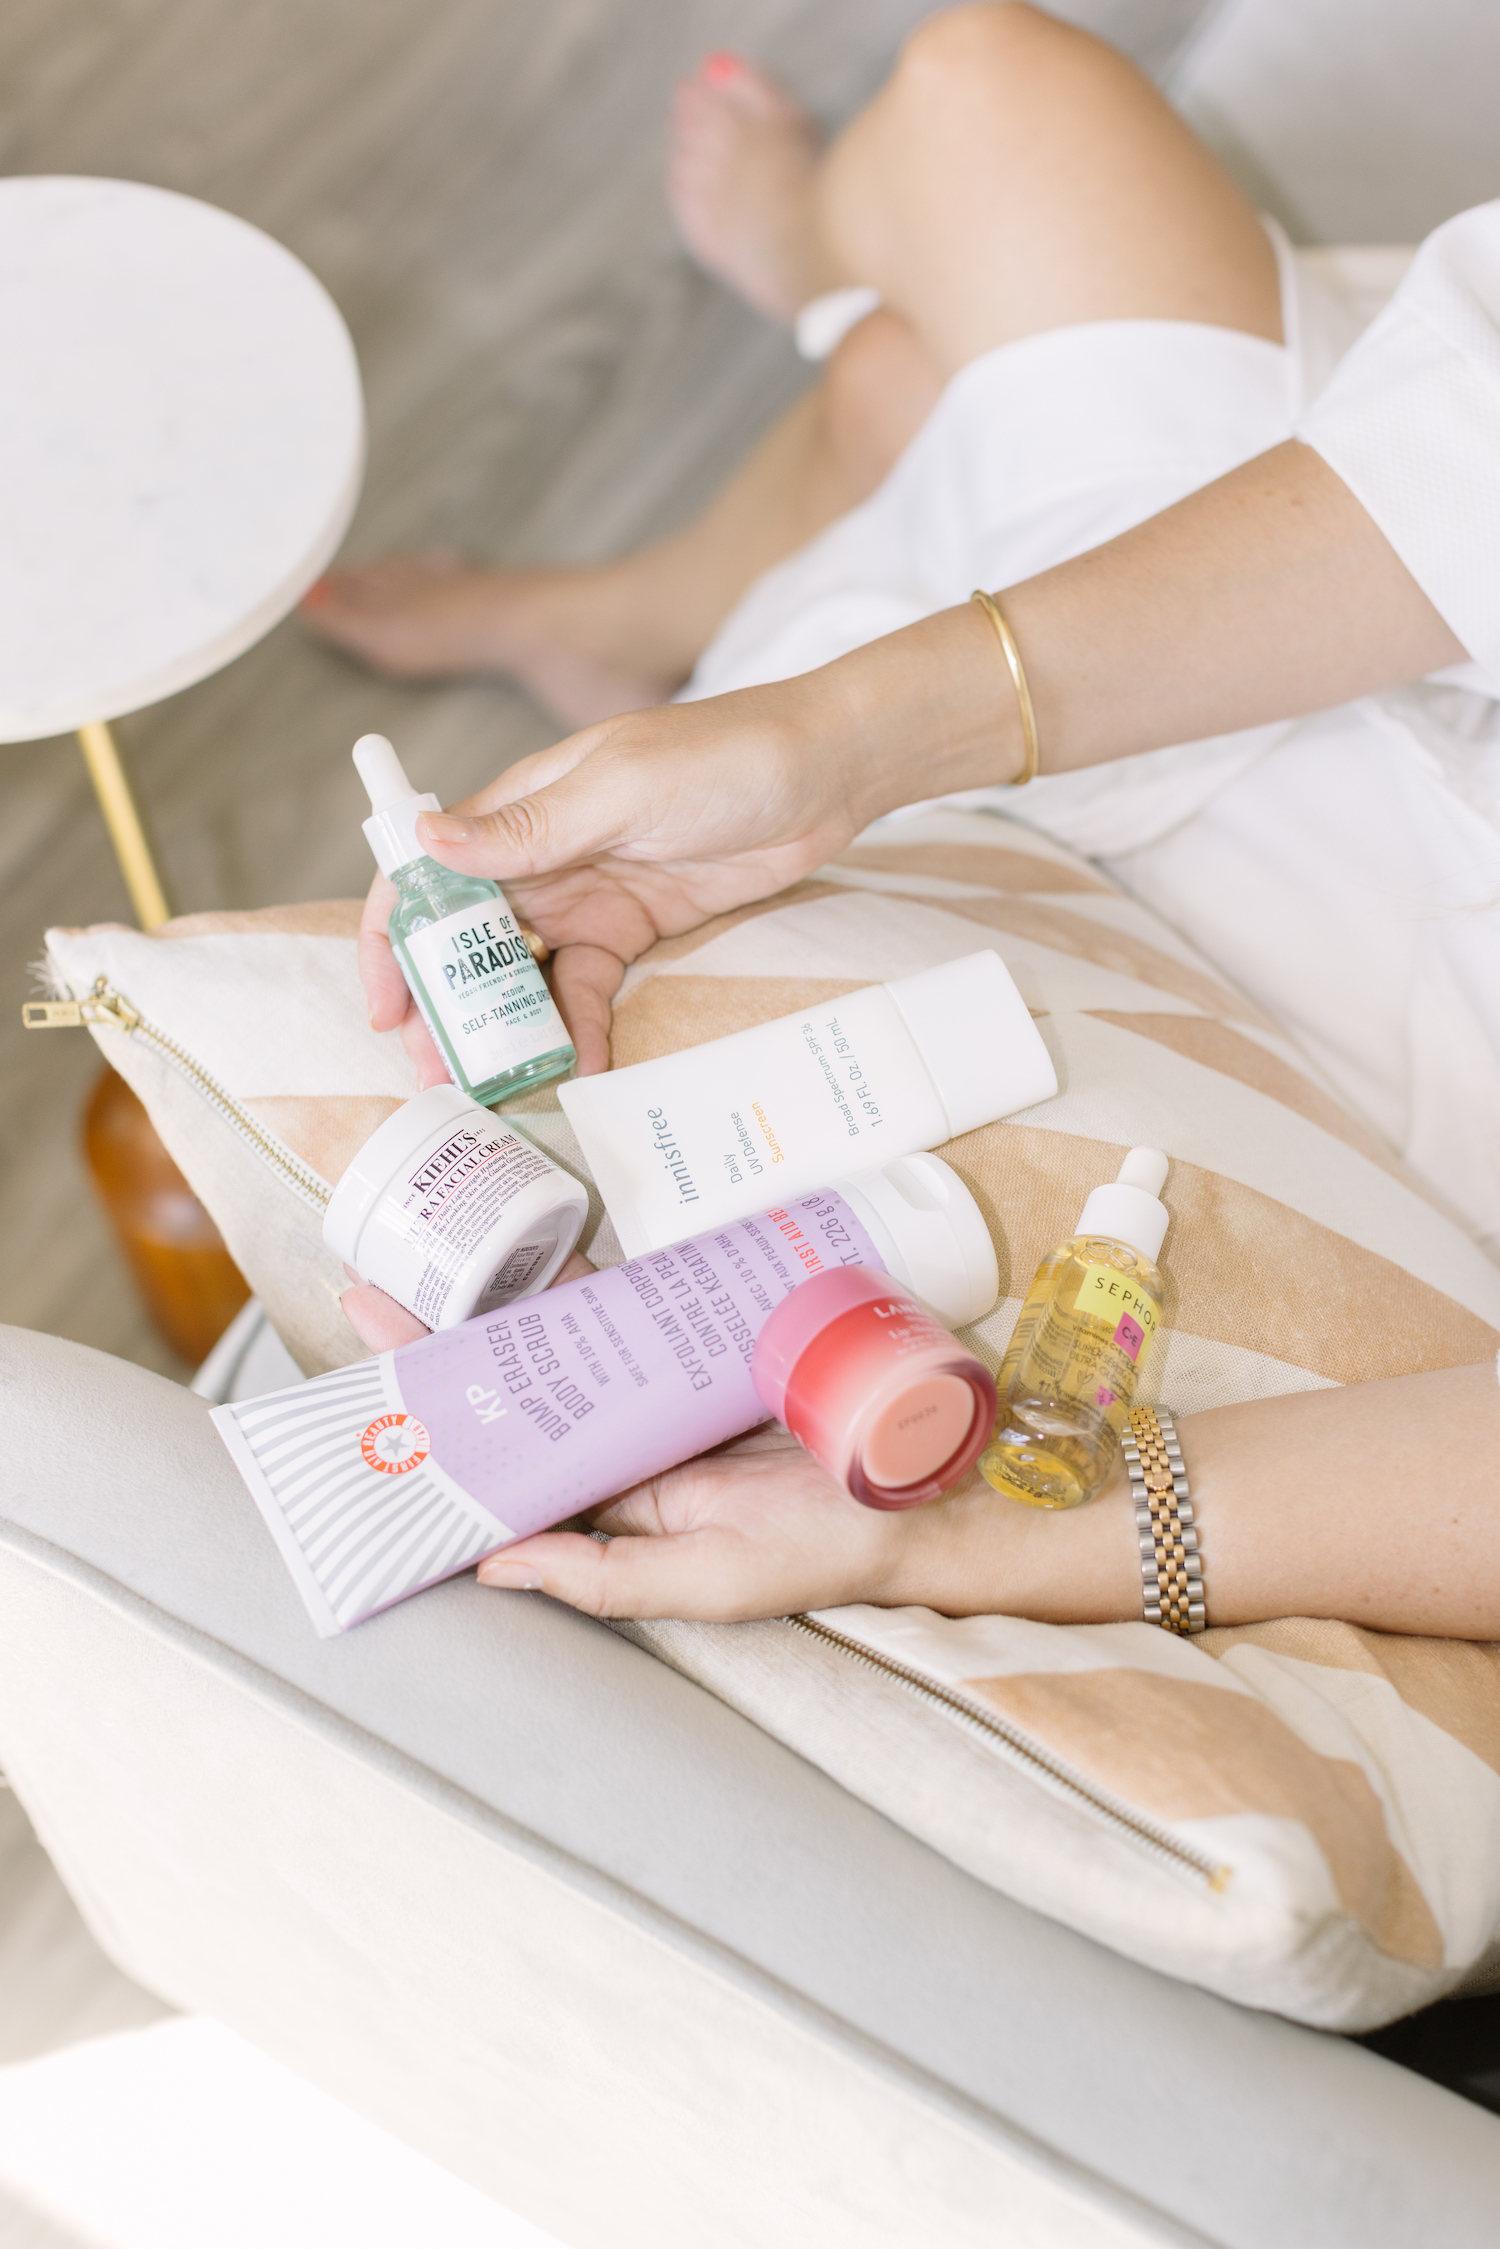 Sephora skincare brands